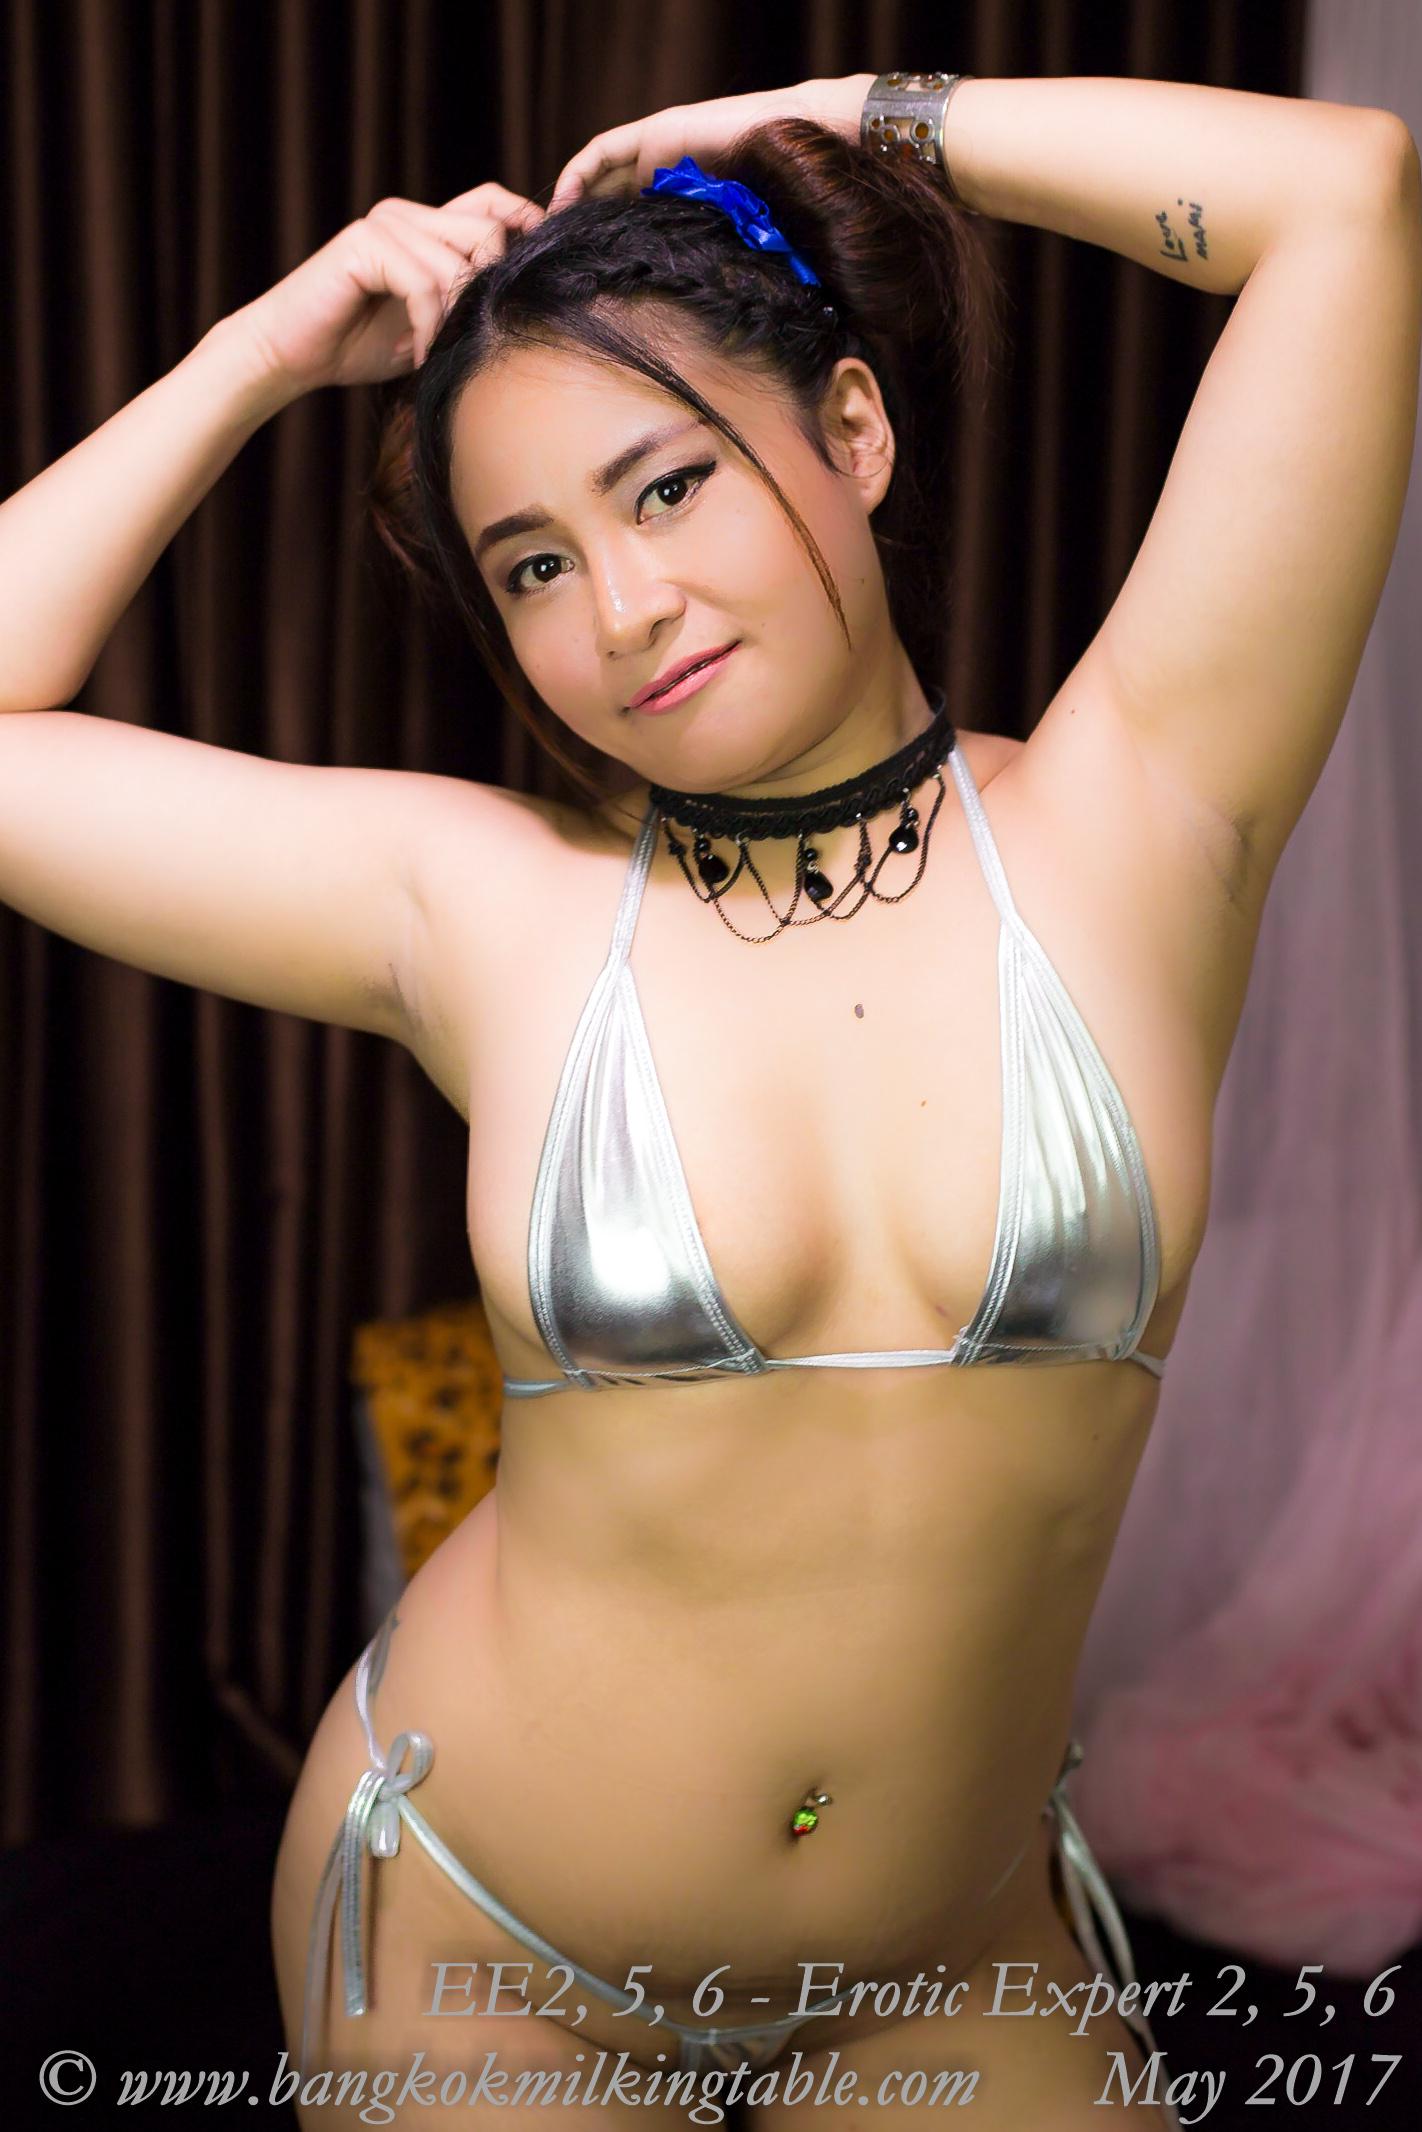 Erotic Expert 2, 5, 6 - string bikini - Bangkok Escort Massage Milking 0517-19